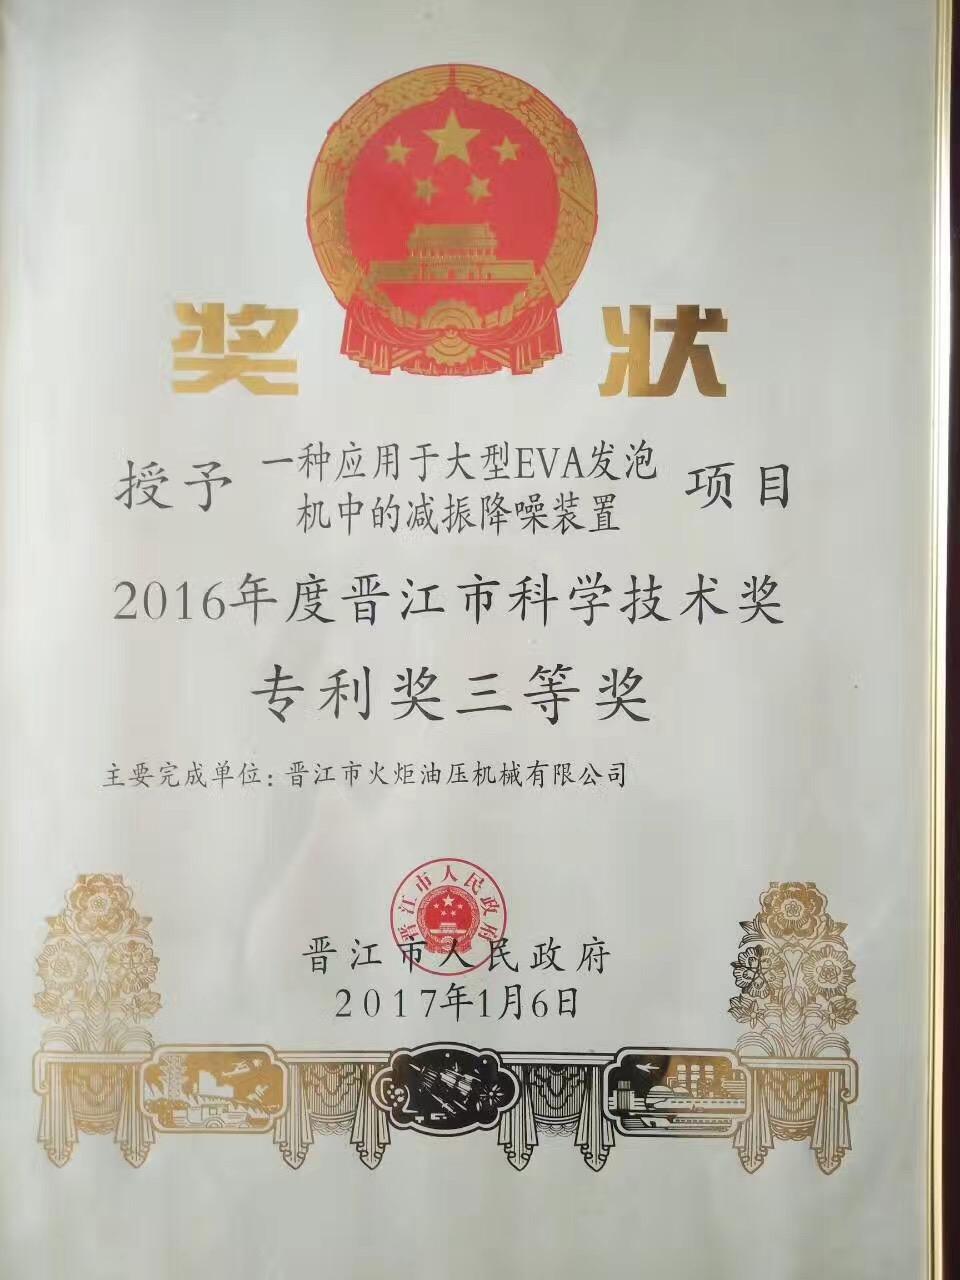 Third prize awards